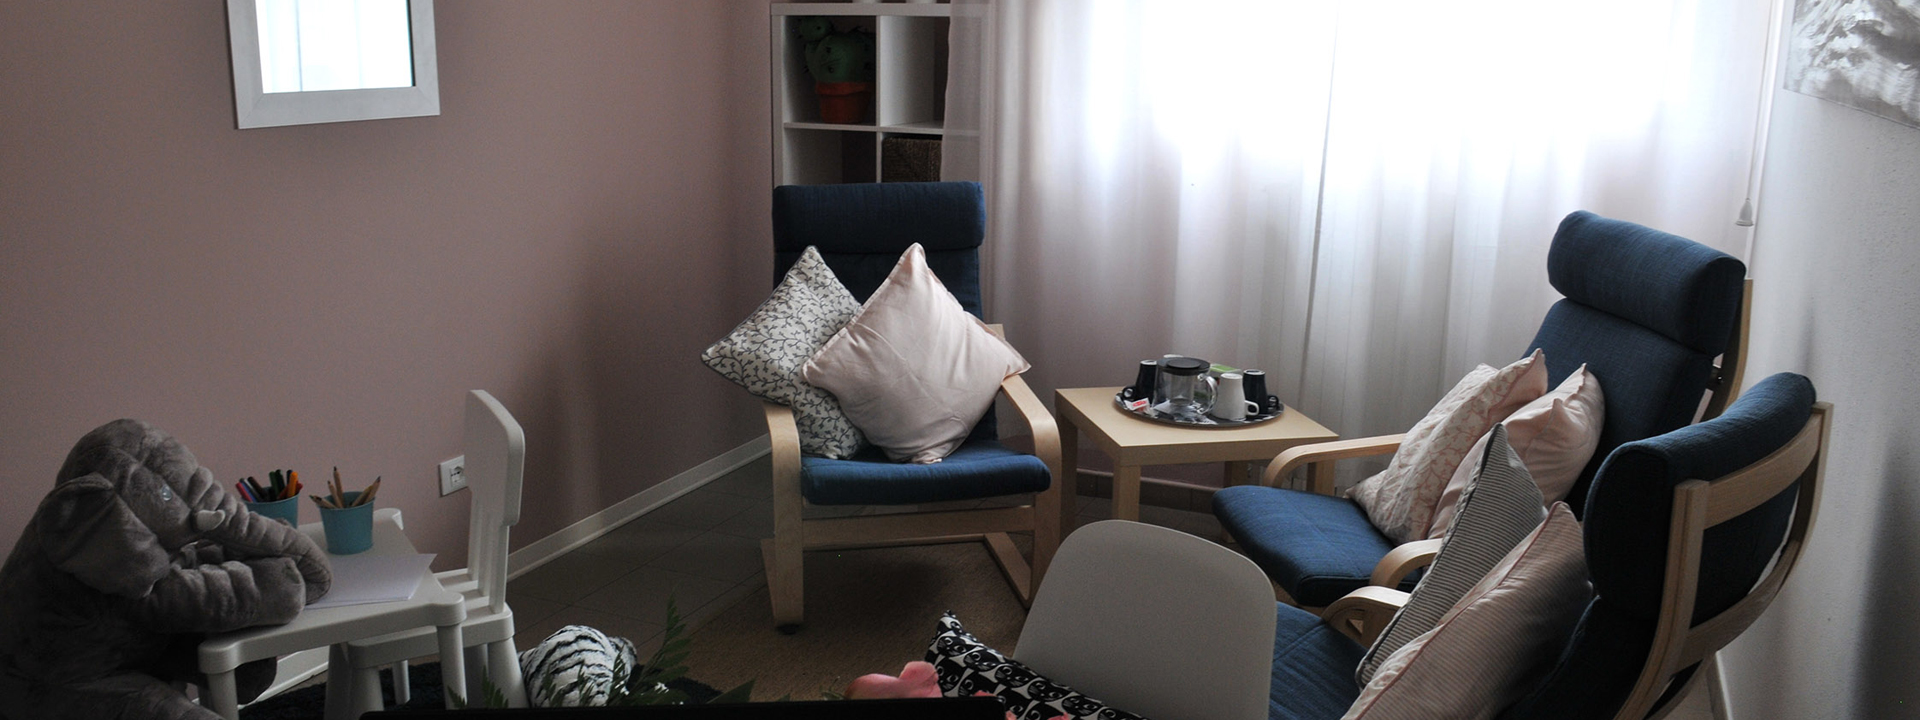 Immagine di una stanza rosa